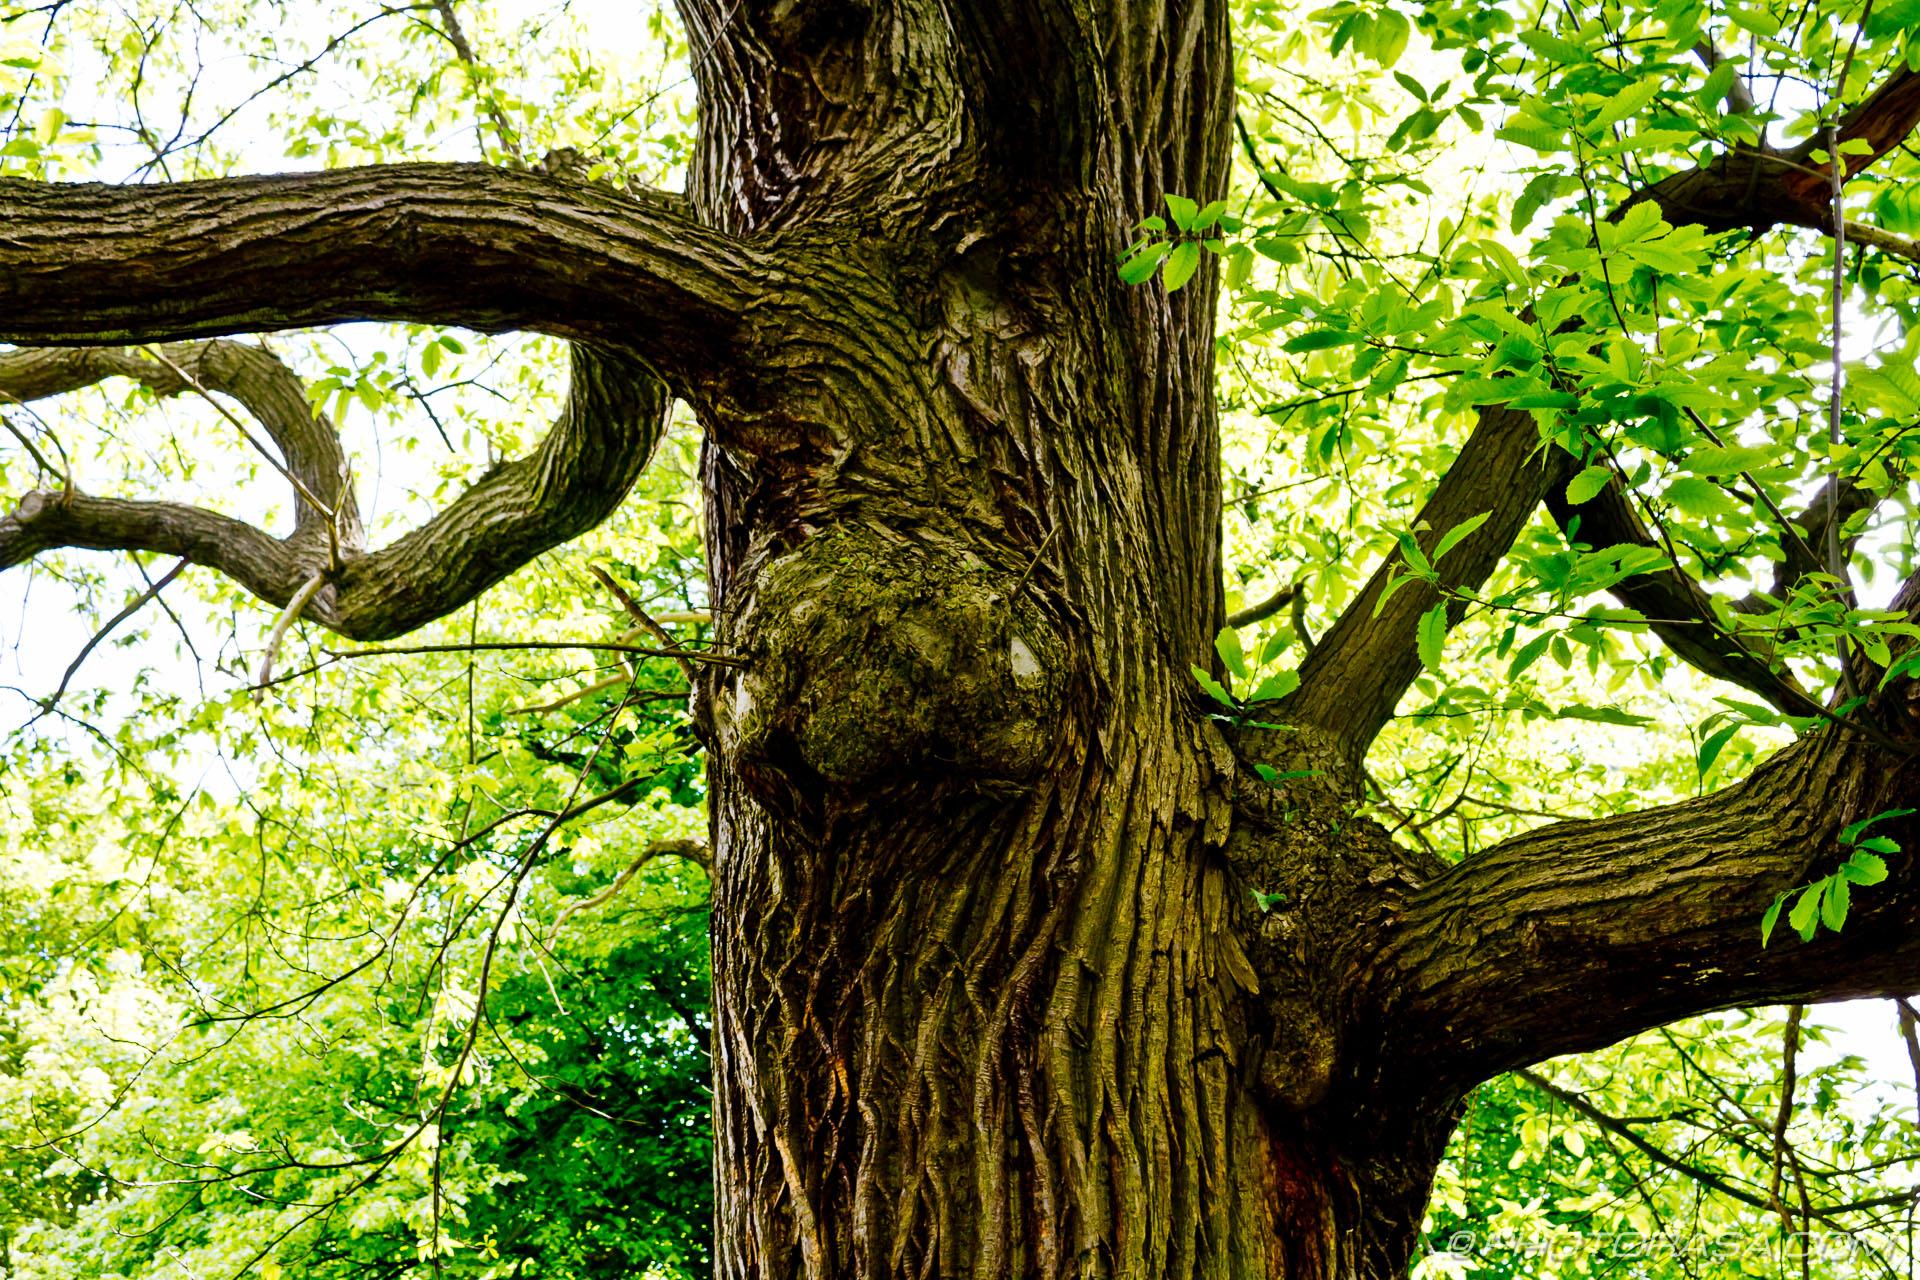 https://photorasa.com/wood-and-bark-textures/trunk-lines/